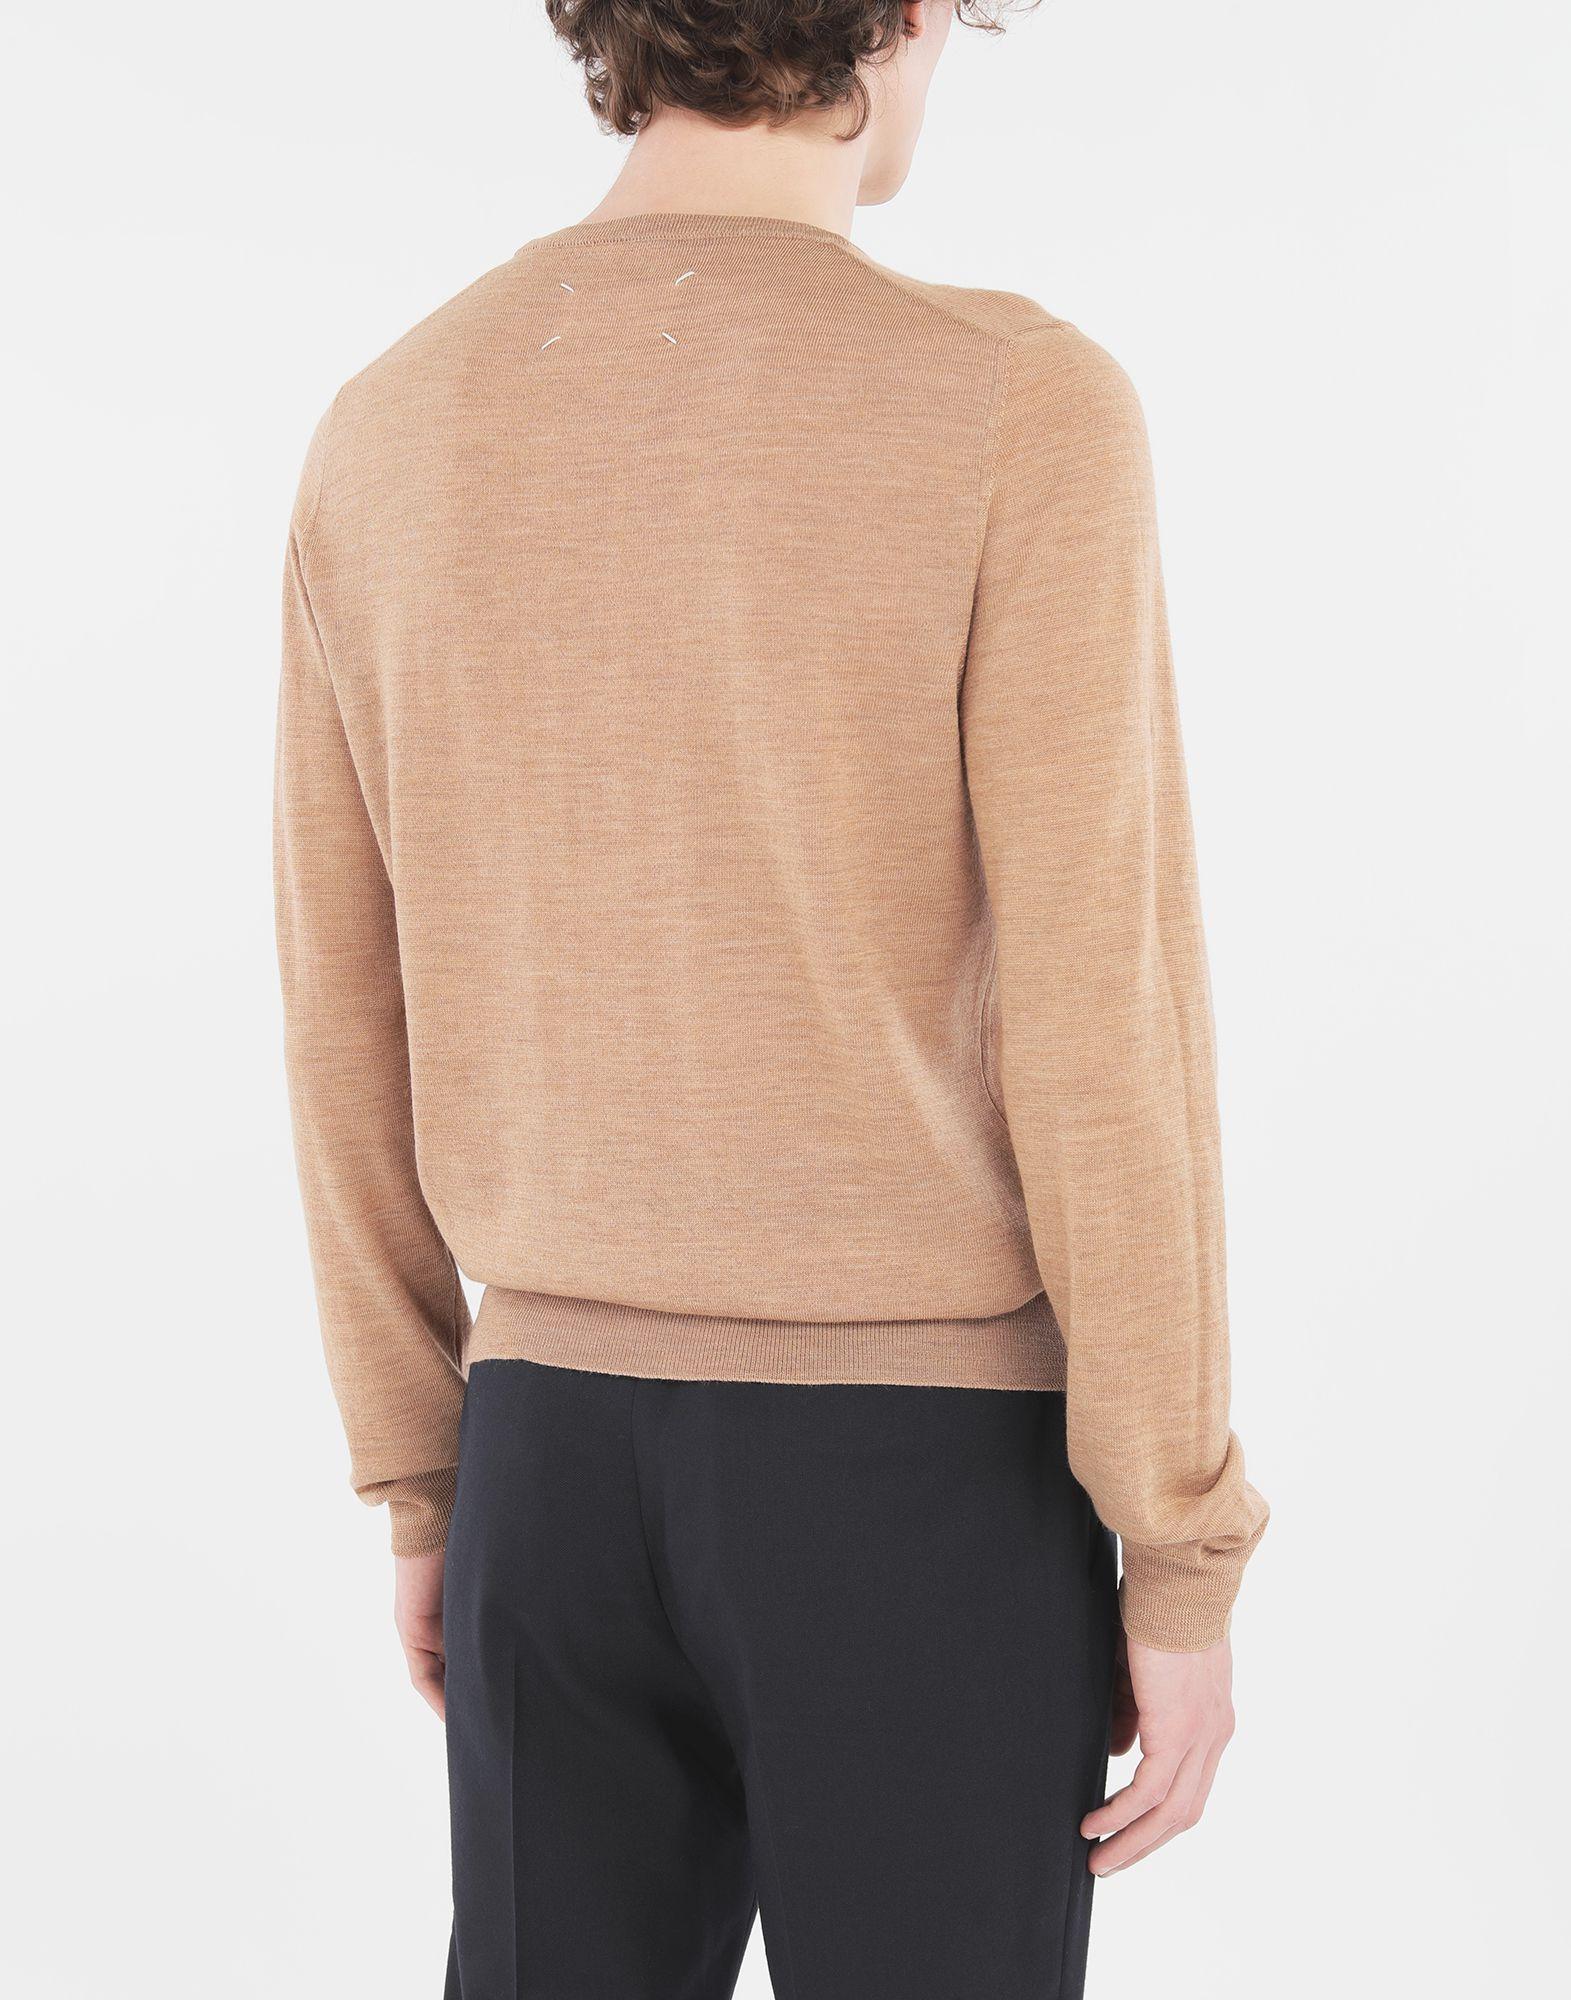 MAISON MARGIELA Wool sweater Crewneck sweater Man d